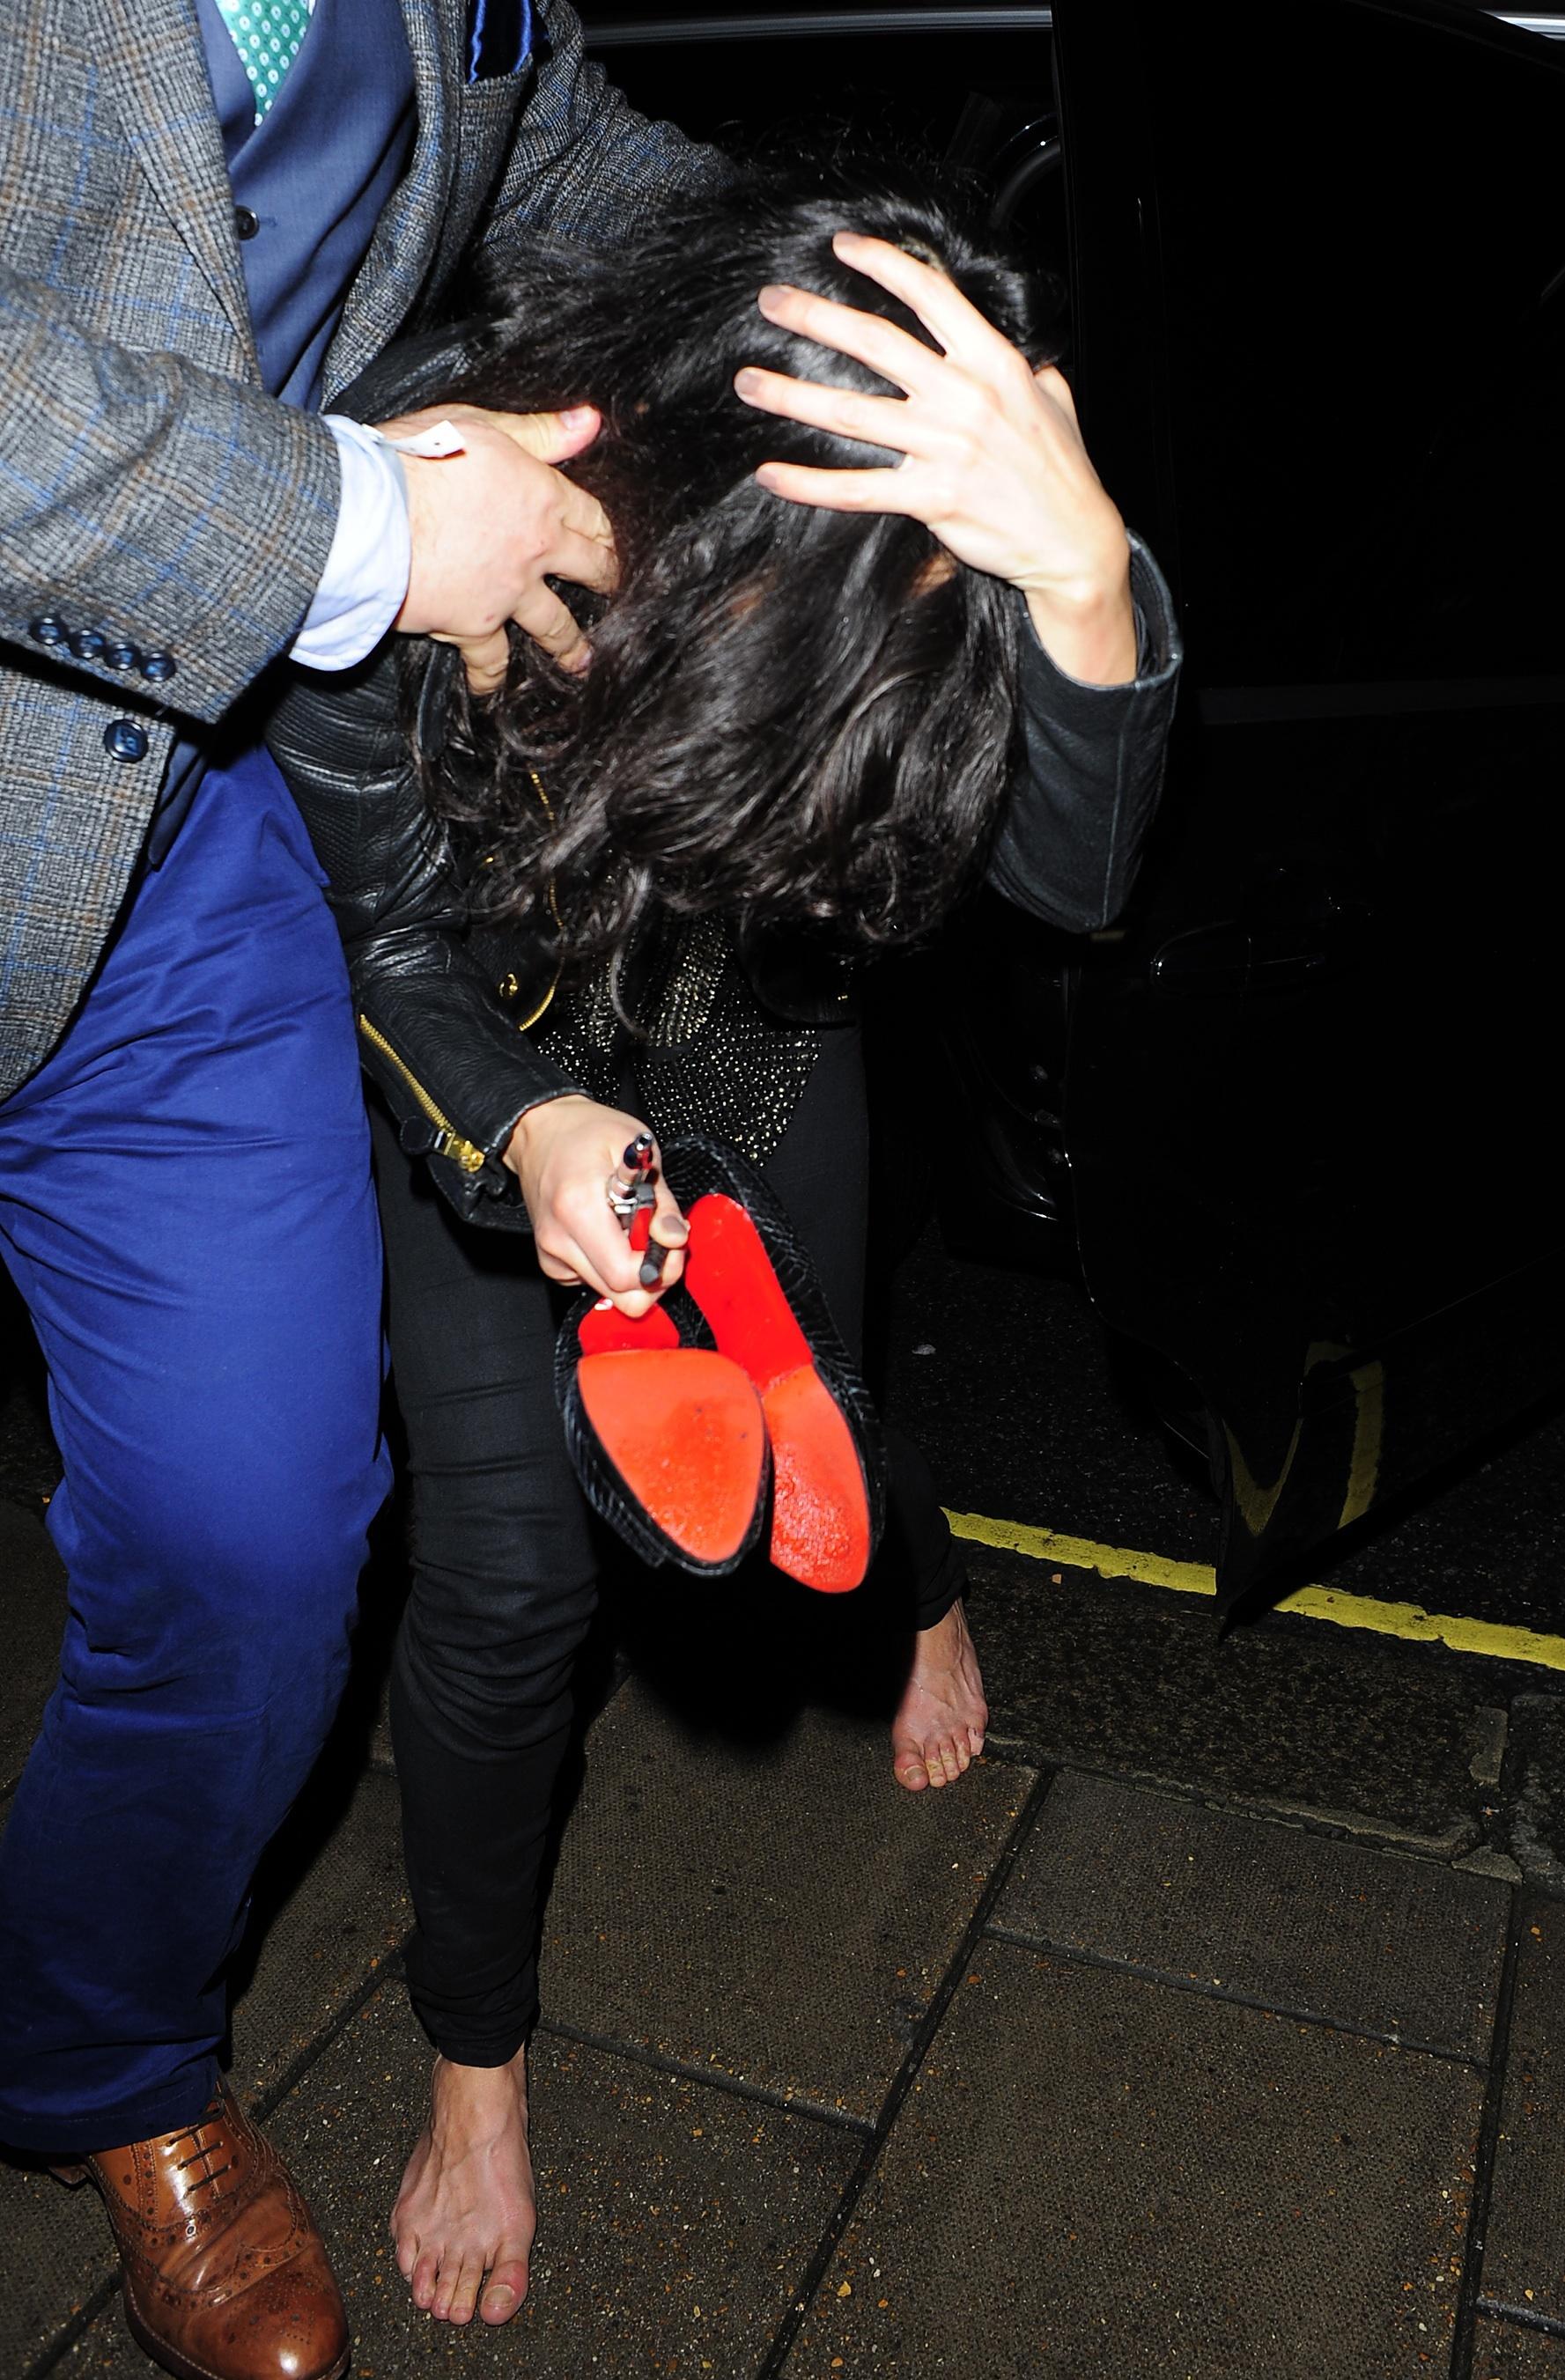 https://pics.wikifeet.com/Michelle-Rodriguez-Feet-1524114.jpg